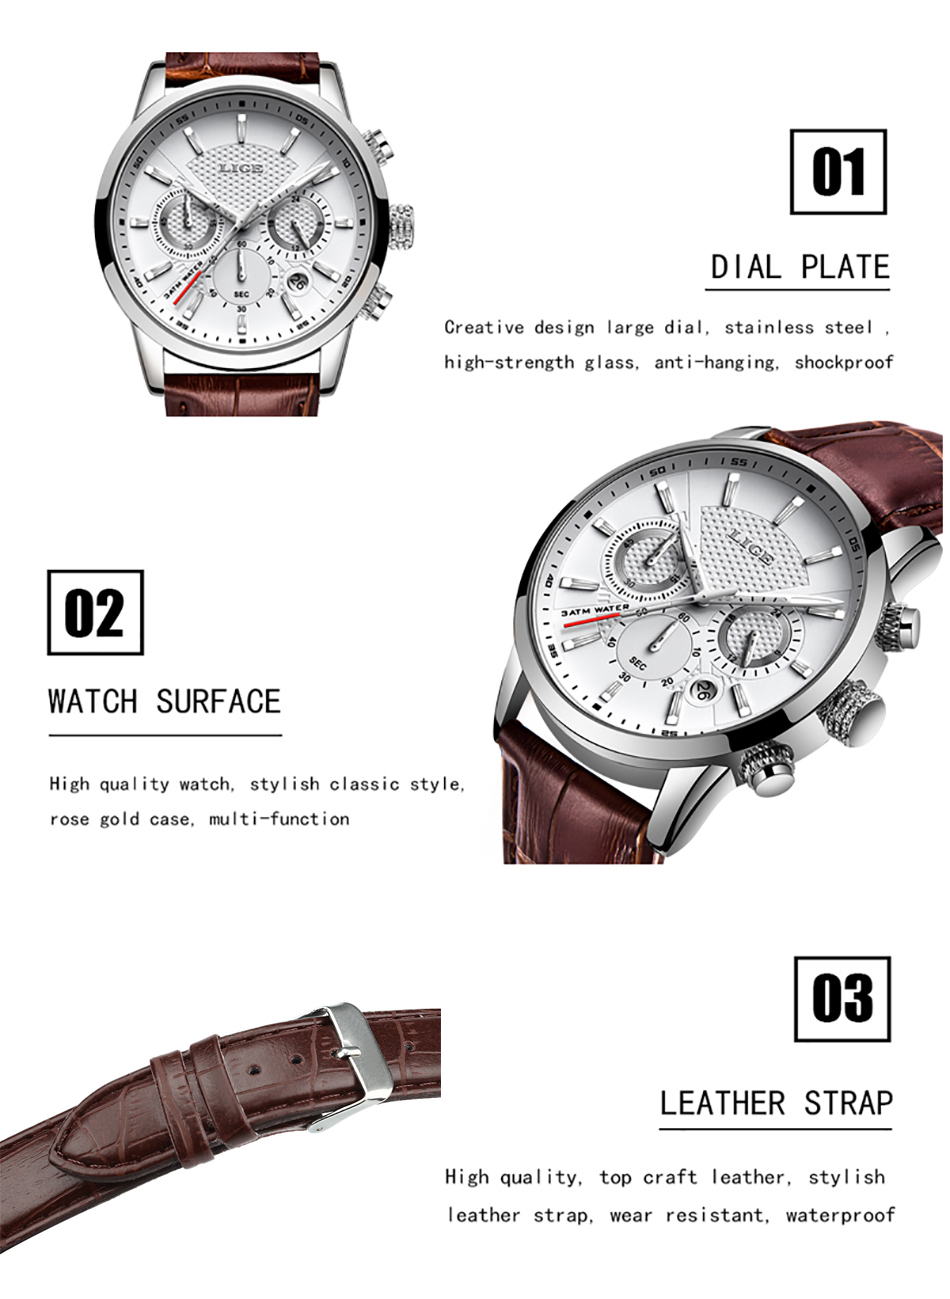 HTB1OKU6cfc3T1VjSZPfq6AWHXXab LIGE 2019 New Watch Men Fashion Sport Quartz Clock Mens Watches Brand Luxury Leather Business Waterproof Watch Relogio Masculino